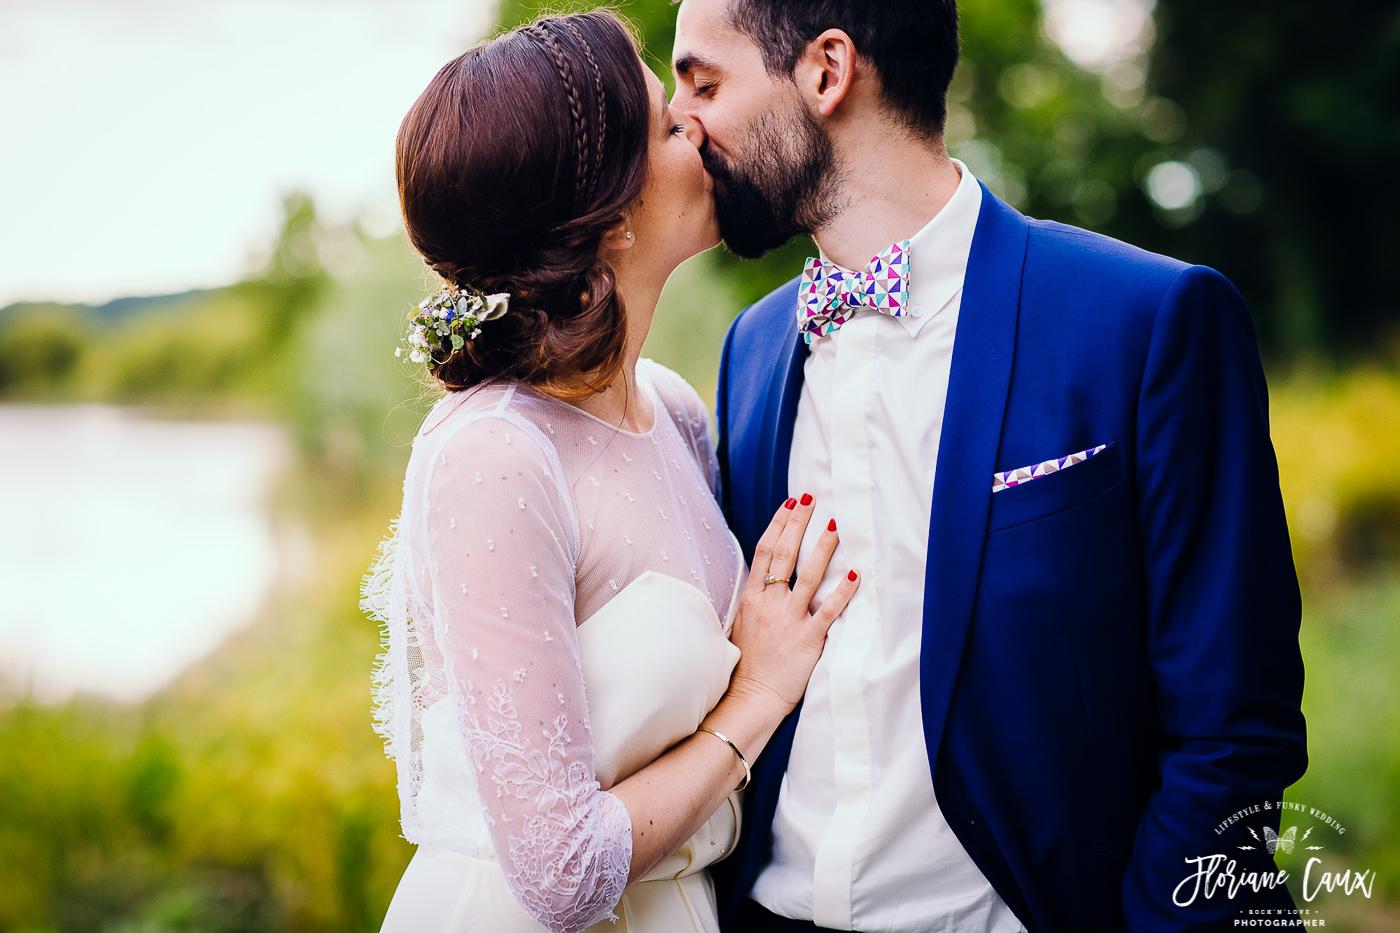 photographe-mariage-pays-basque-Floriane-Caux (42)